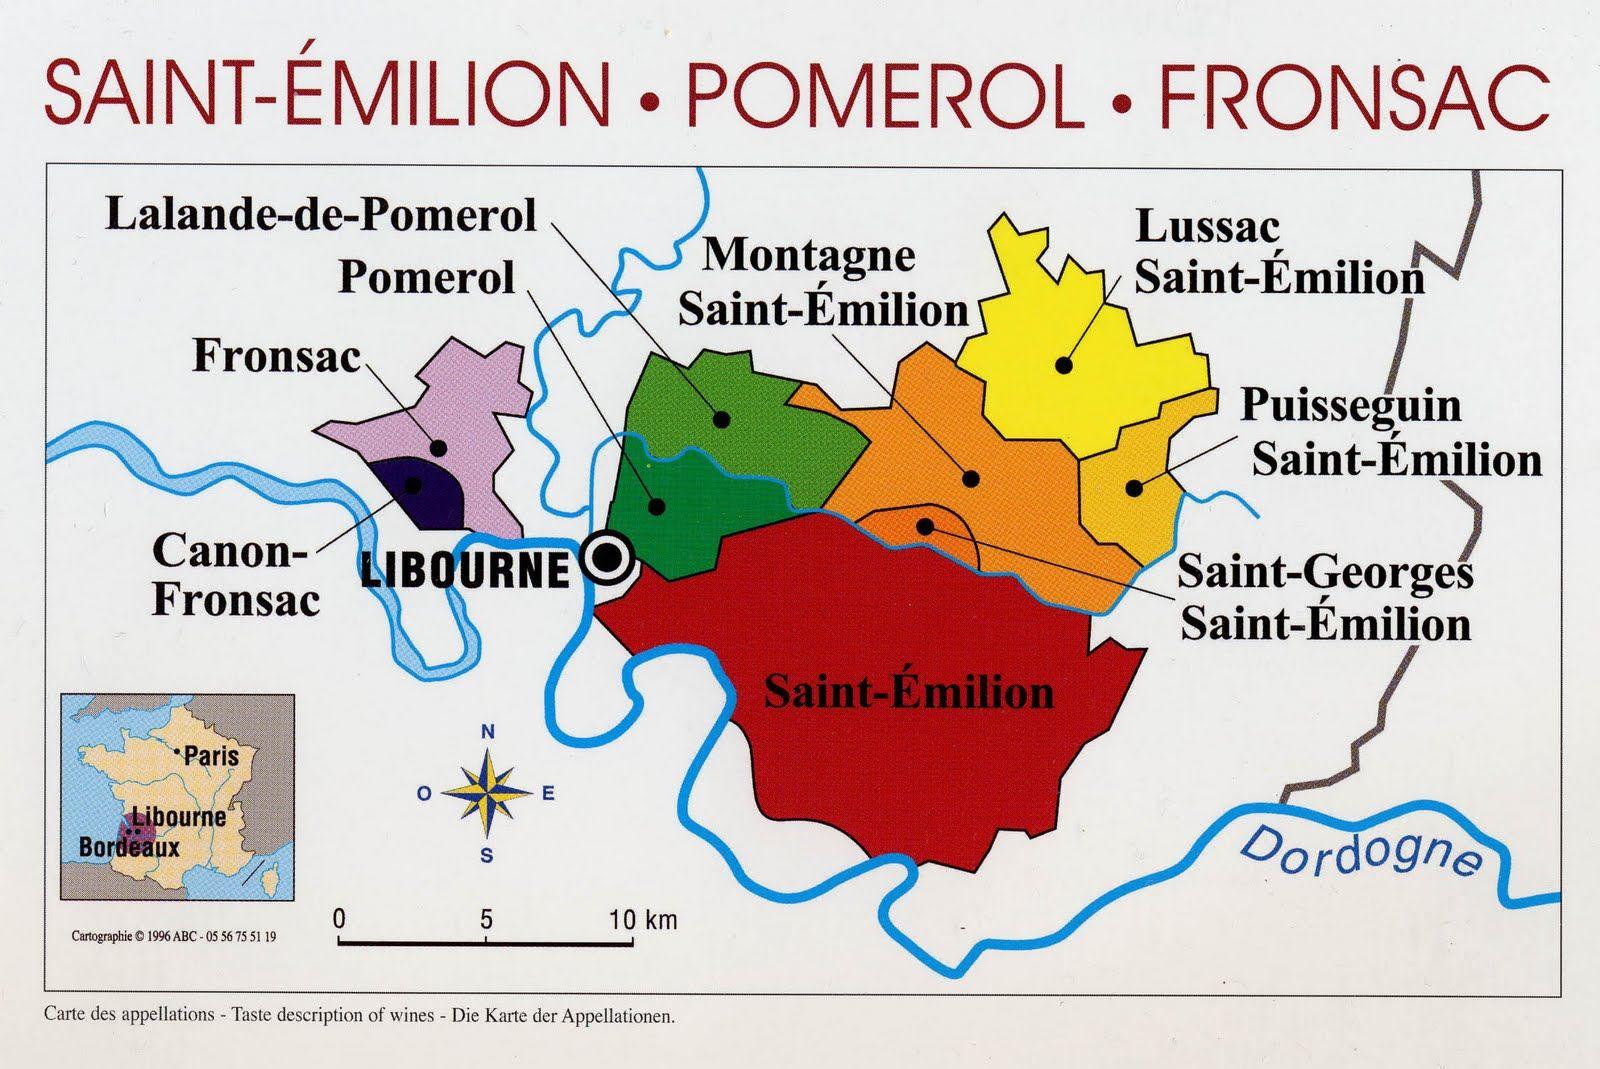 Wine Mise En Abyme The St Emilion Wine Region Wine Regions France Wine Region Map Wine Region